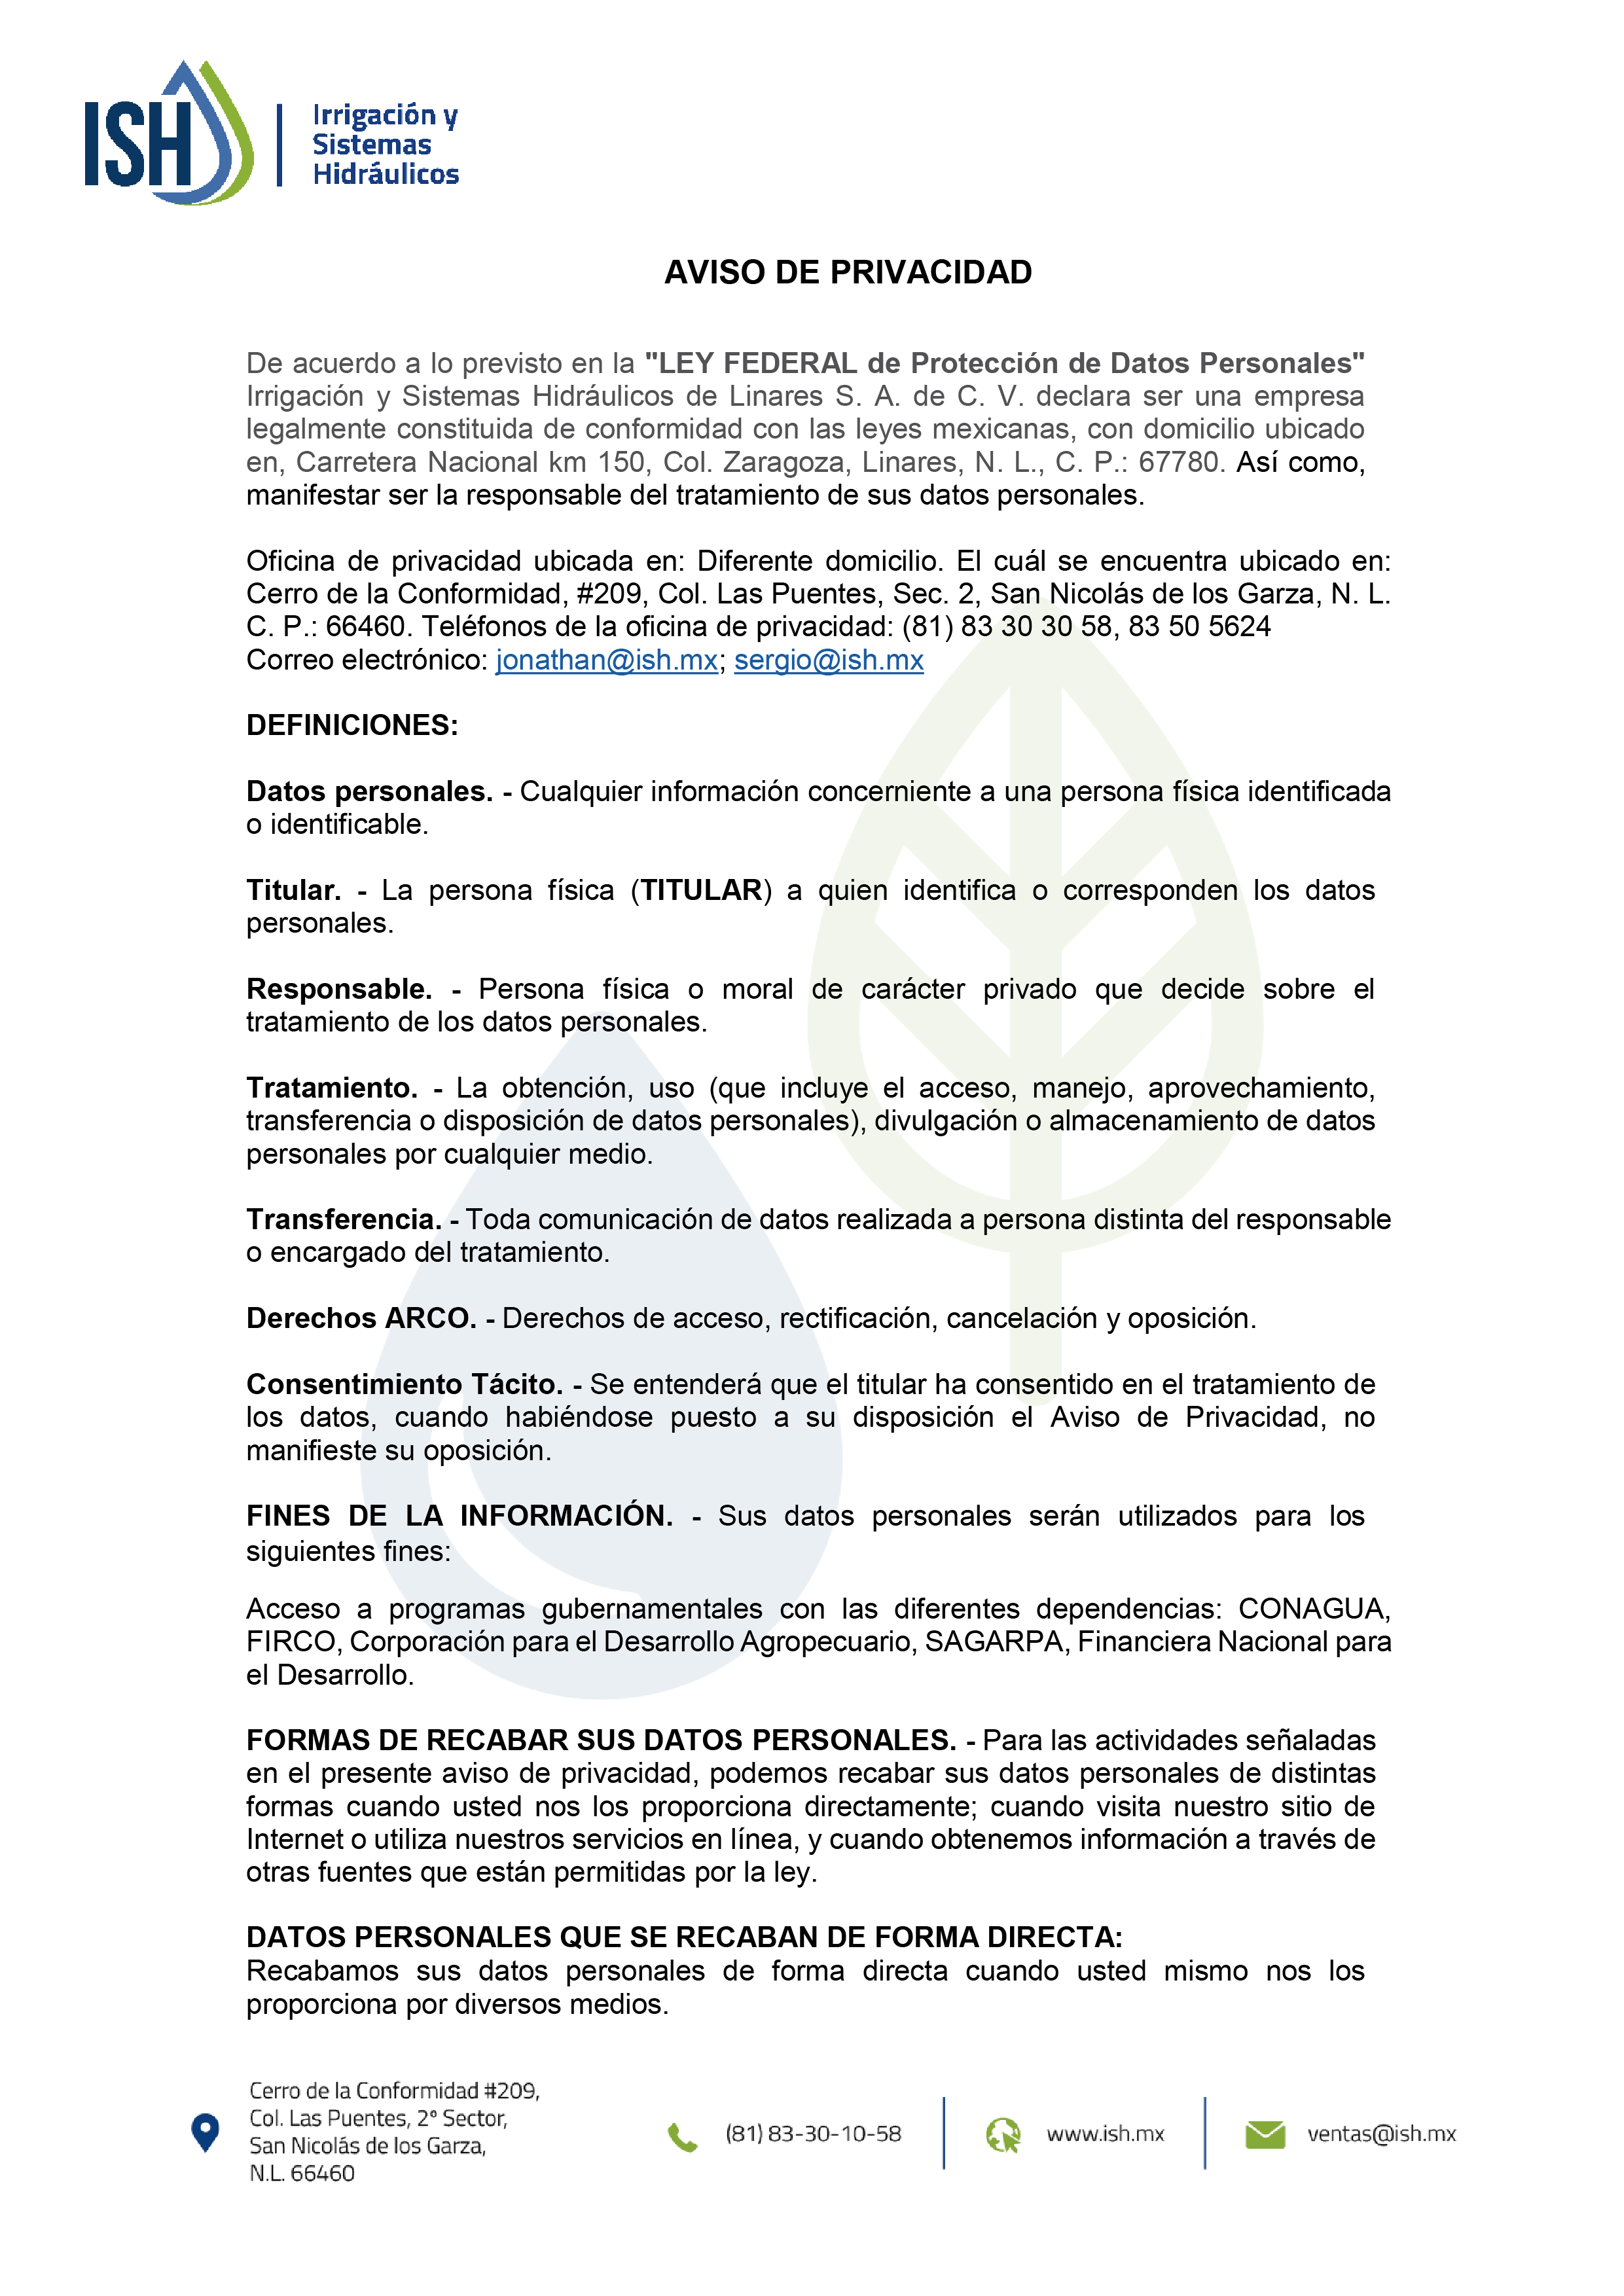 AvisoPrivacidad-01